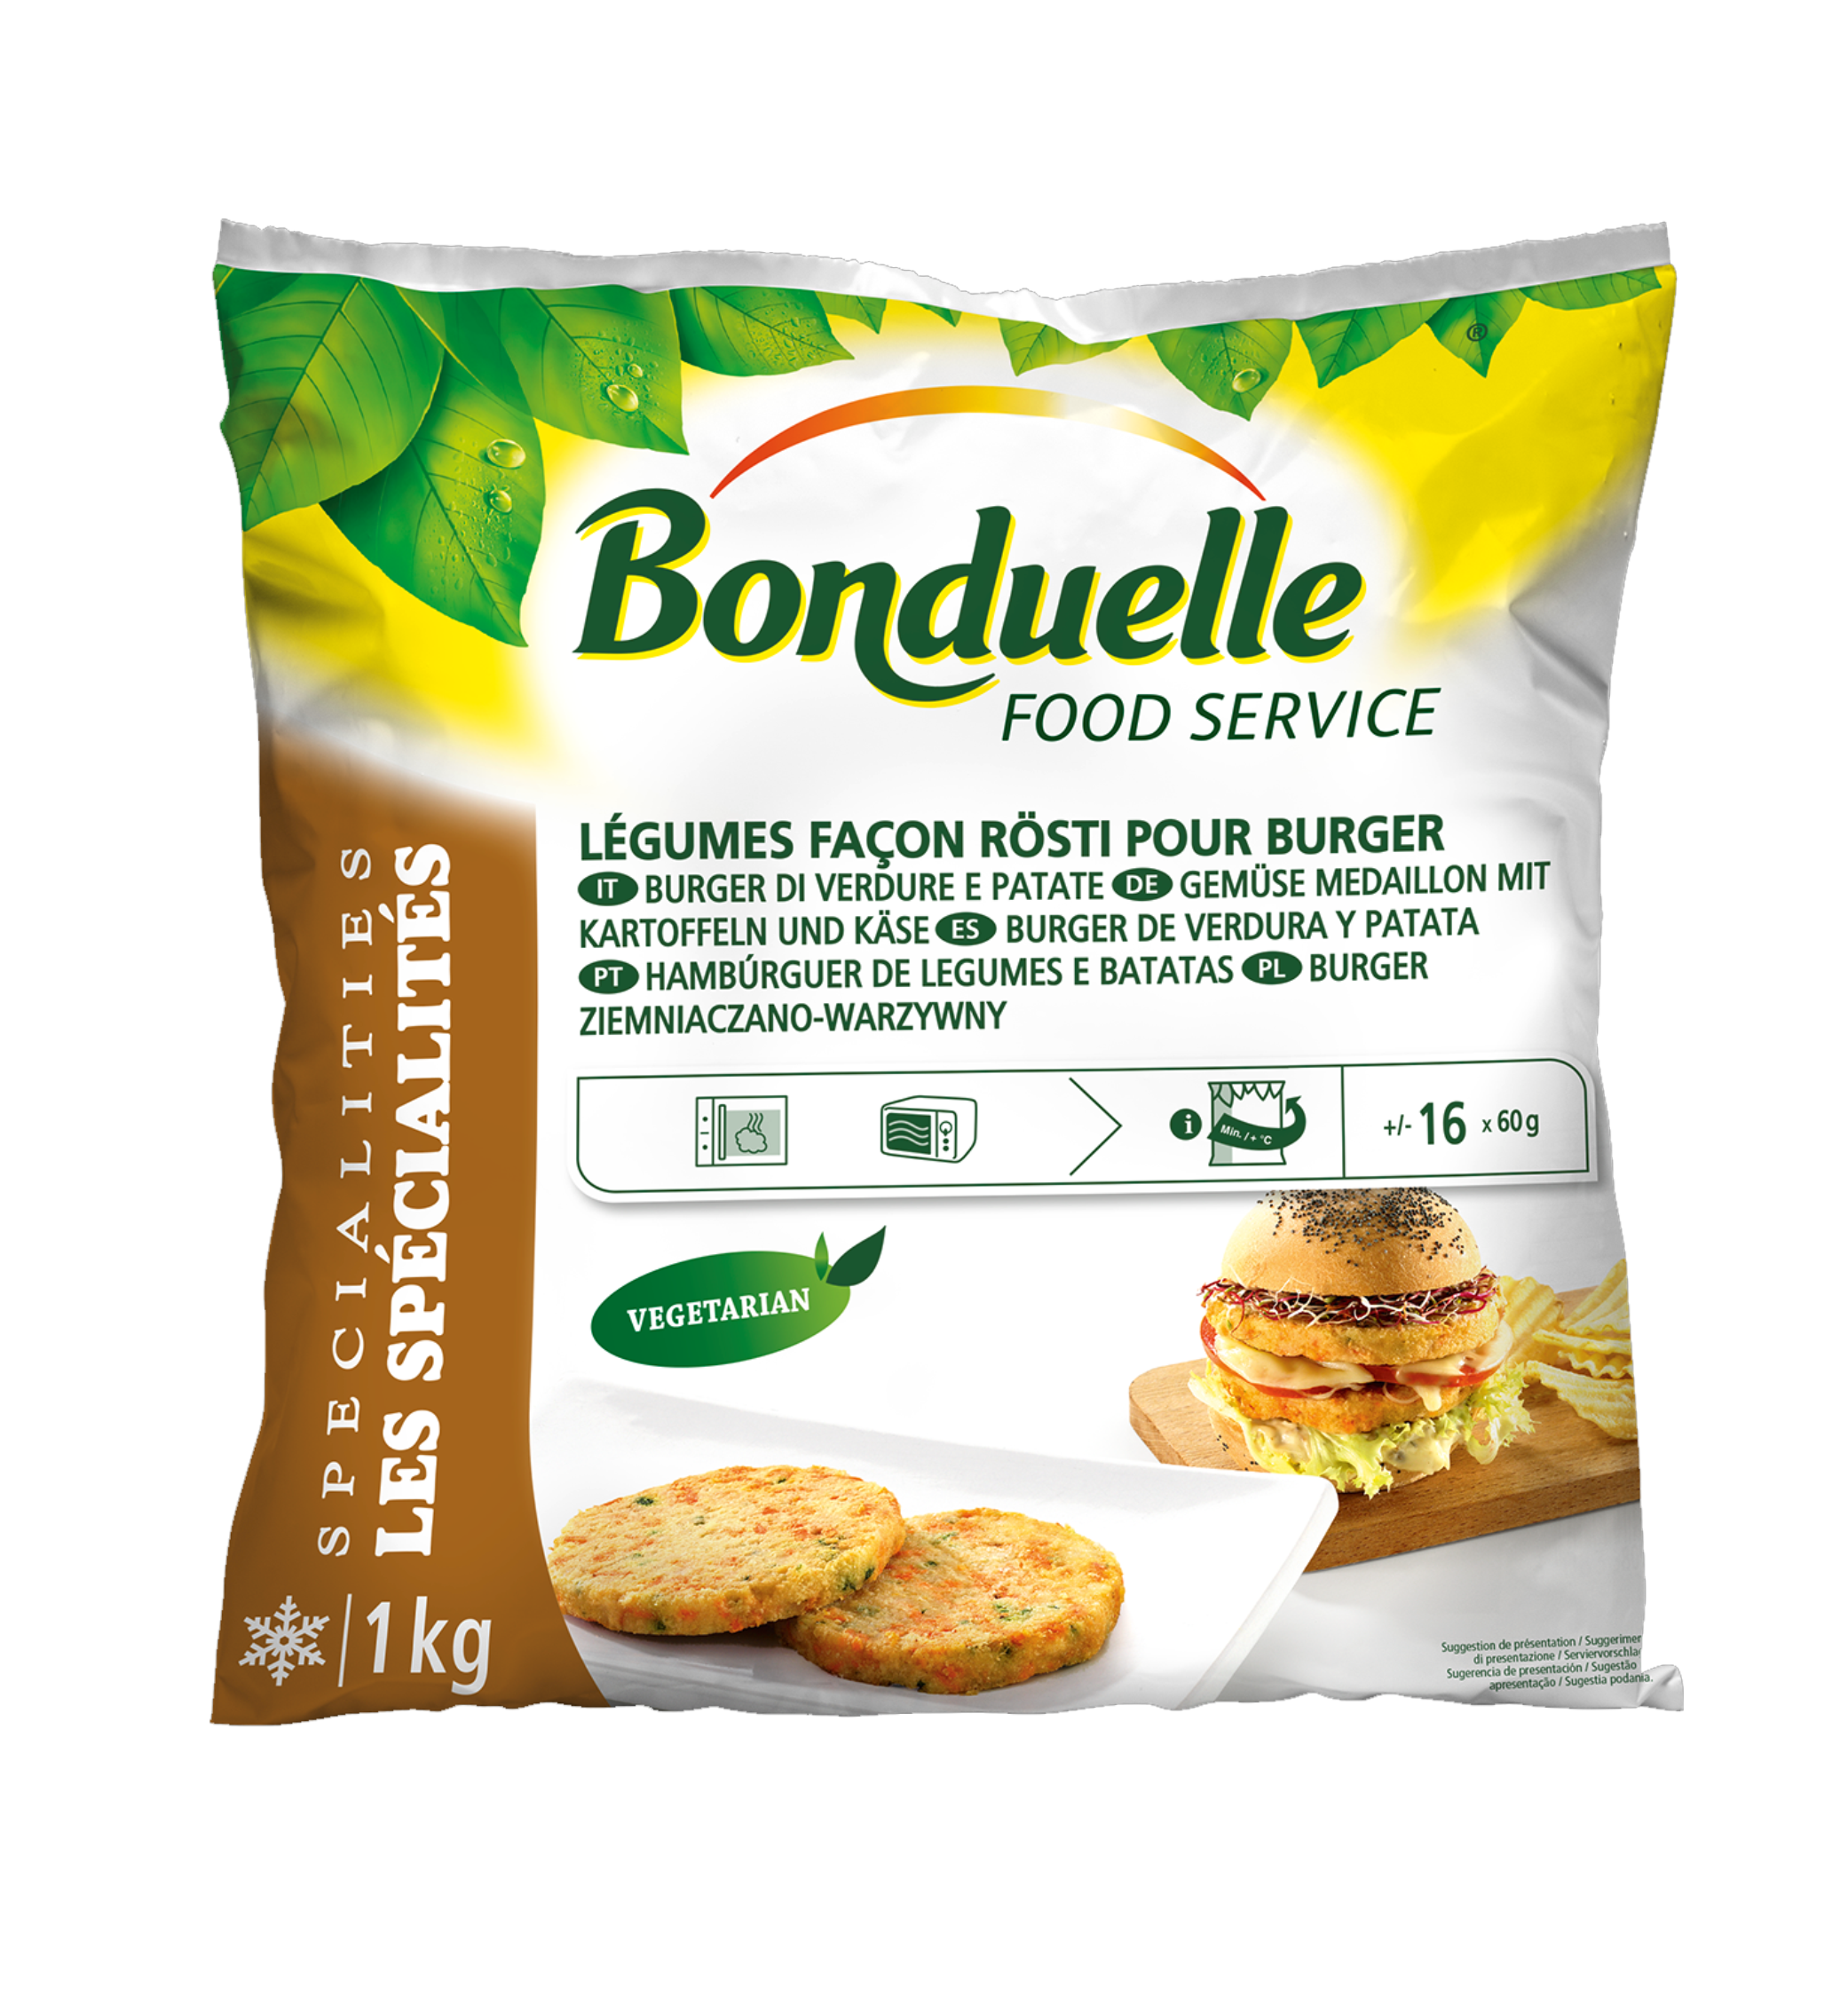 hamburguer-legumes-batatas